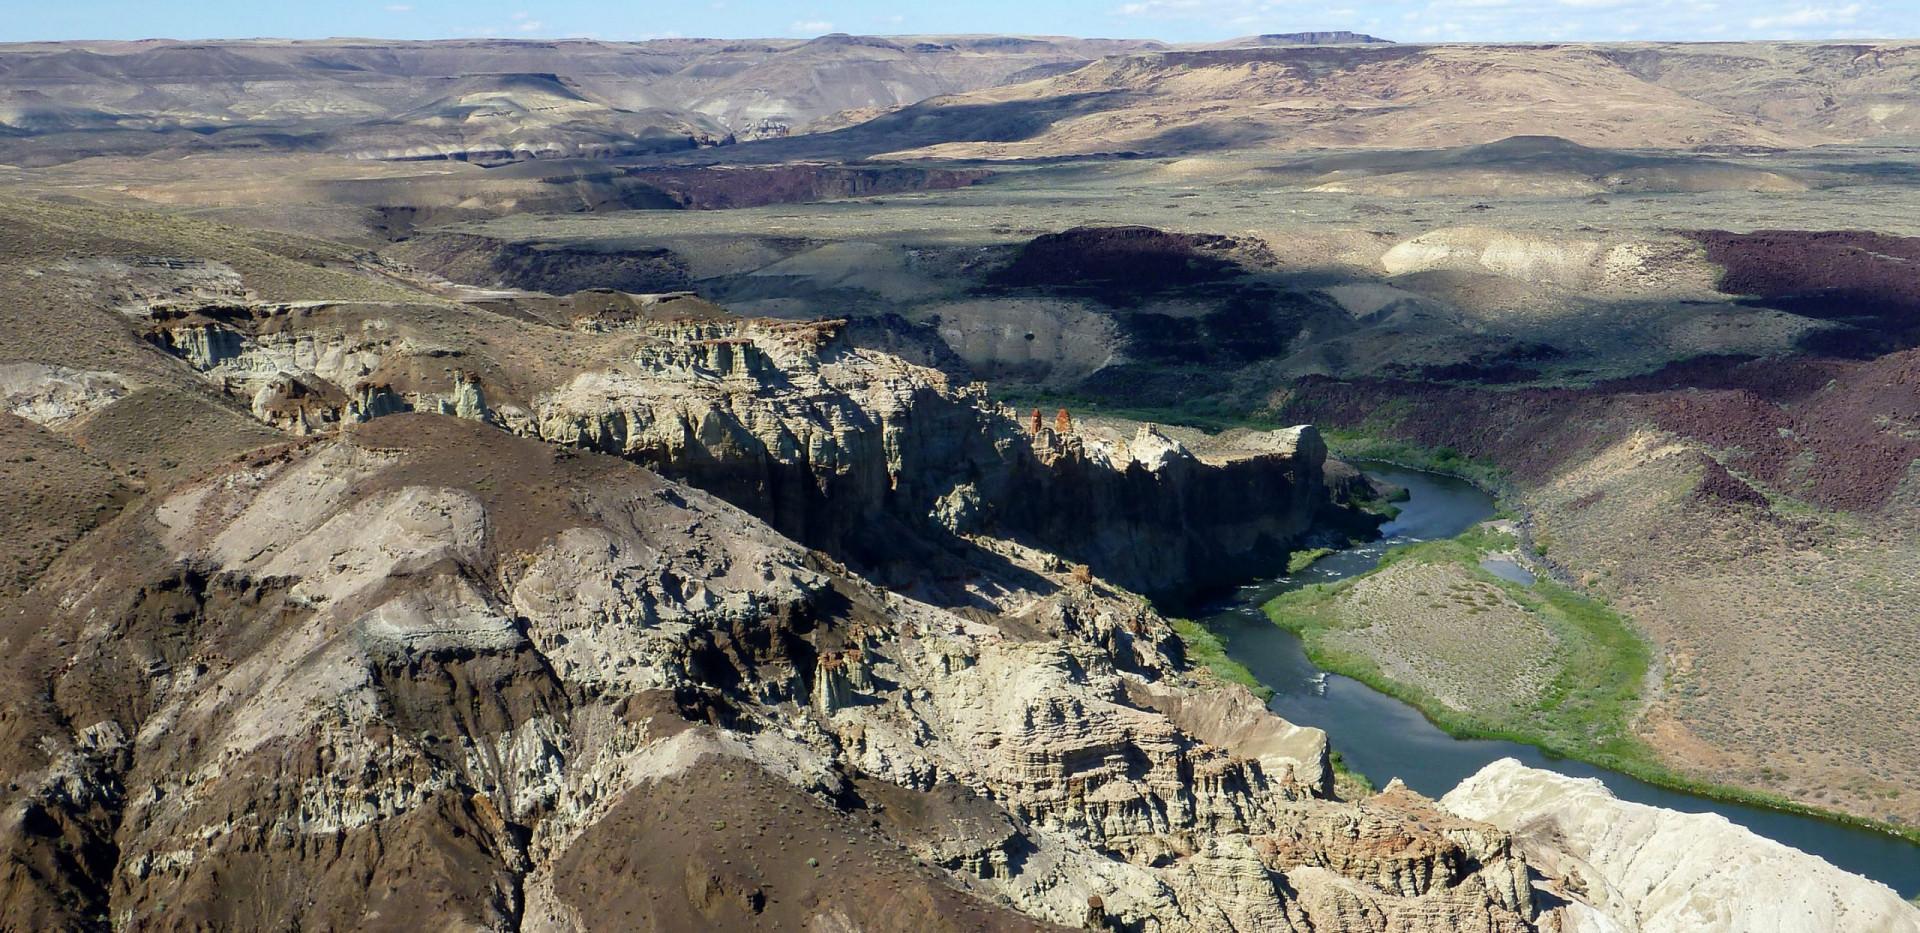 Chalk Basin - Owyhee River Rafting - Grand Canyon of Oregon